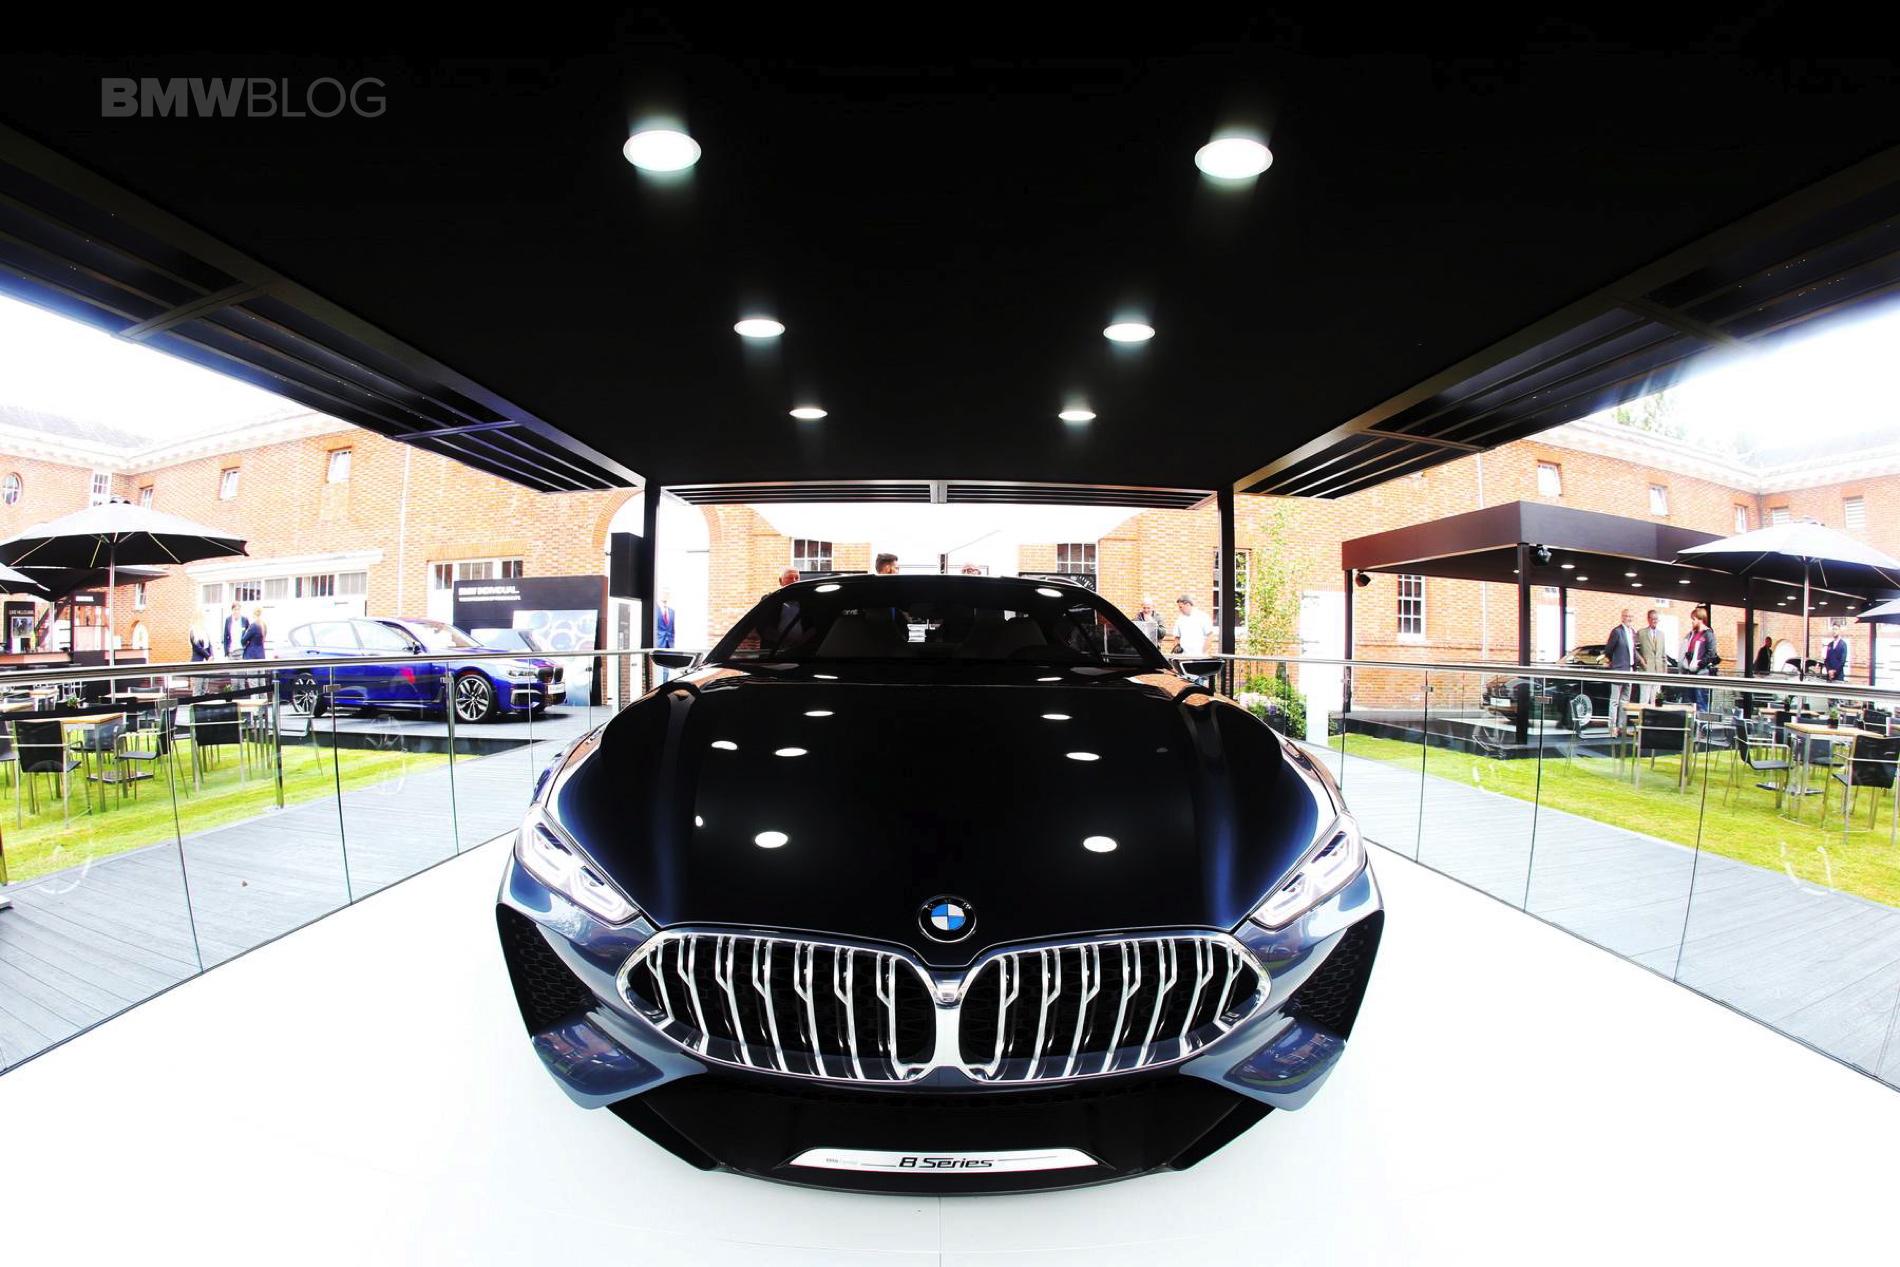 Goodwood BMW 8 Series Concept 11